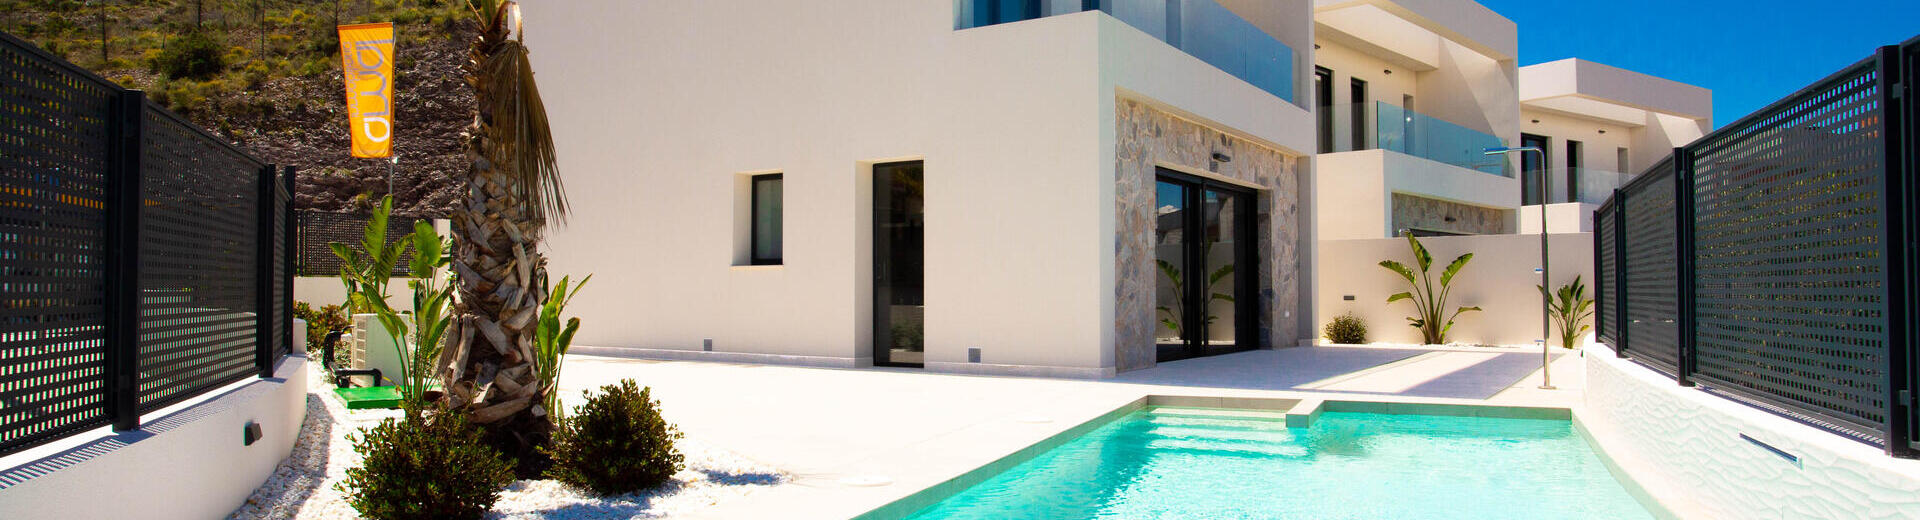 VIP7818: Villa à vendre